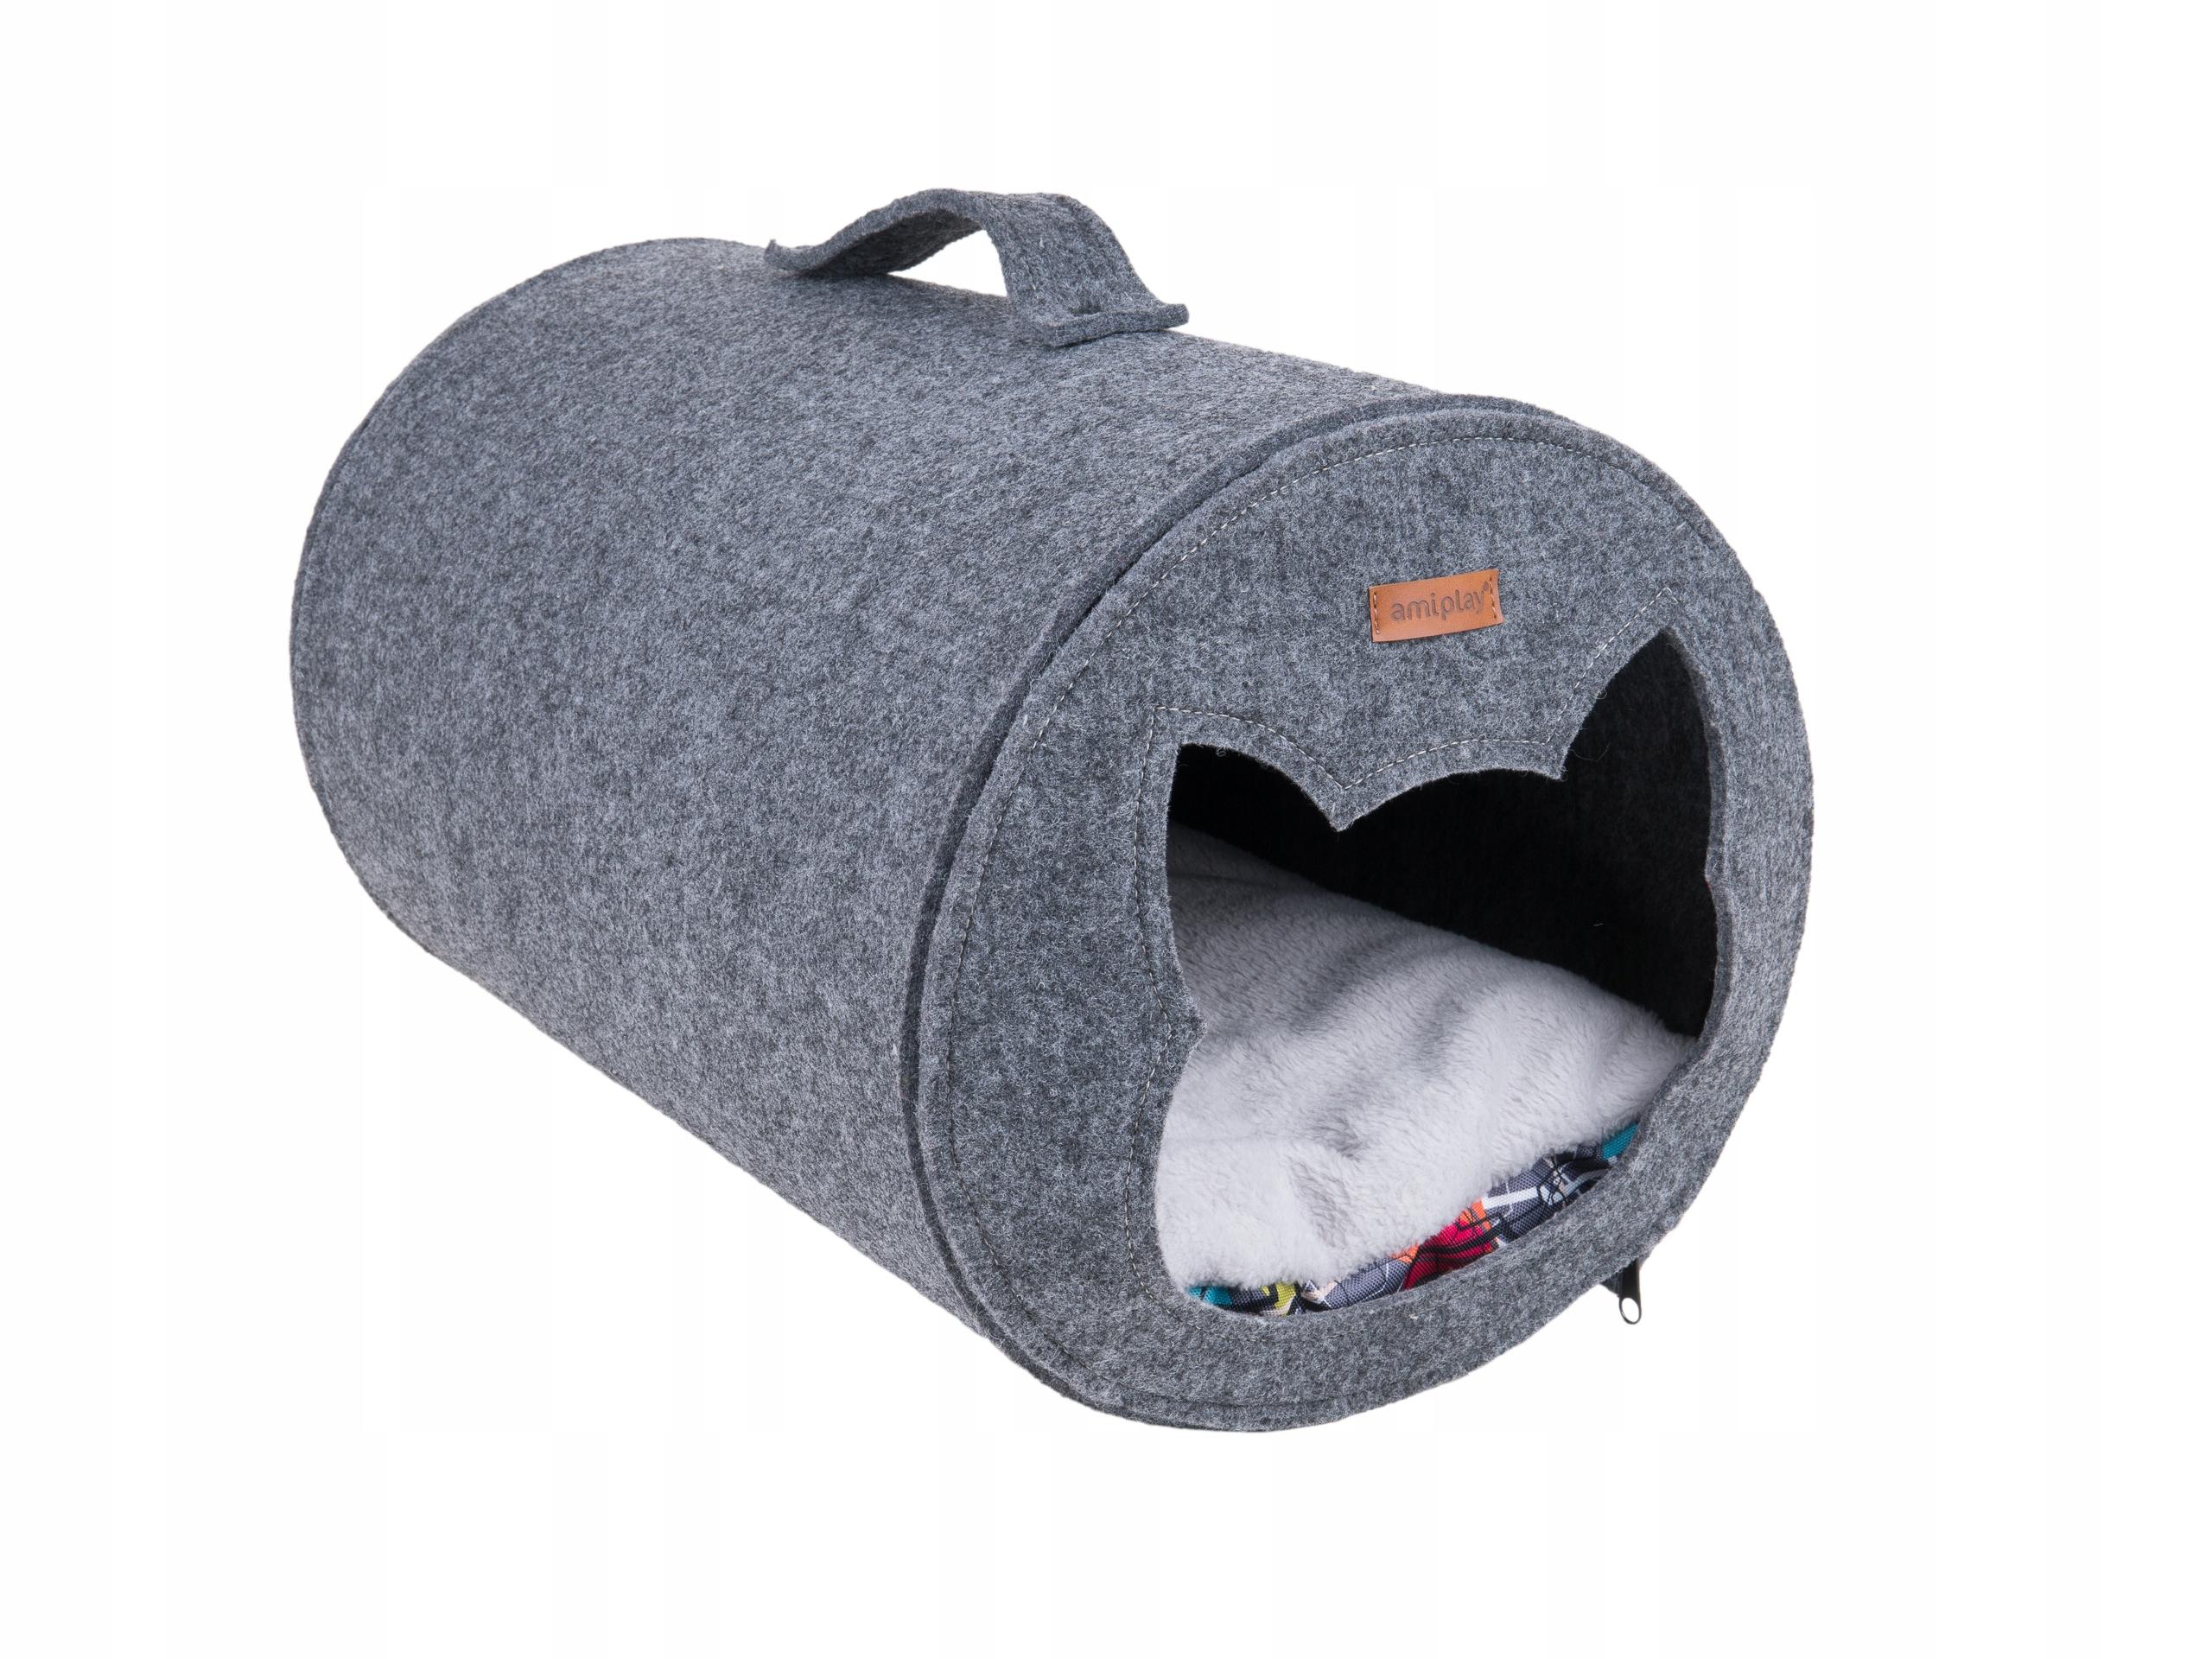 amiplay Hygge Domek tunel dla kota 2in1 Filc